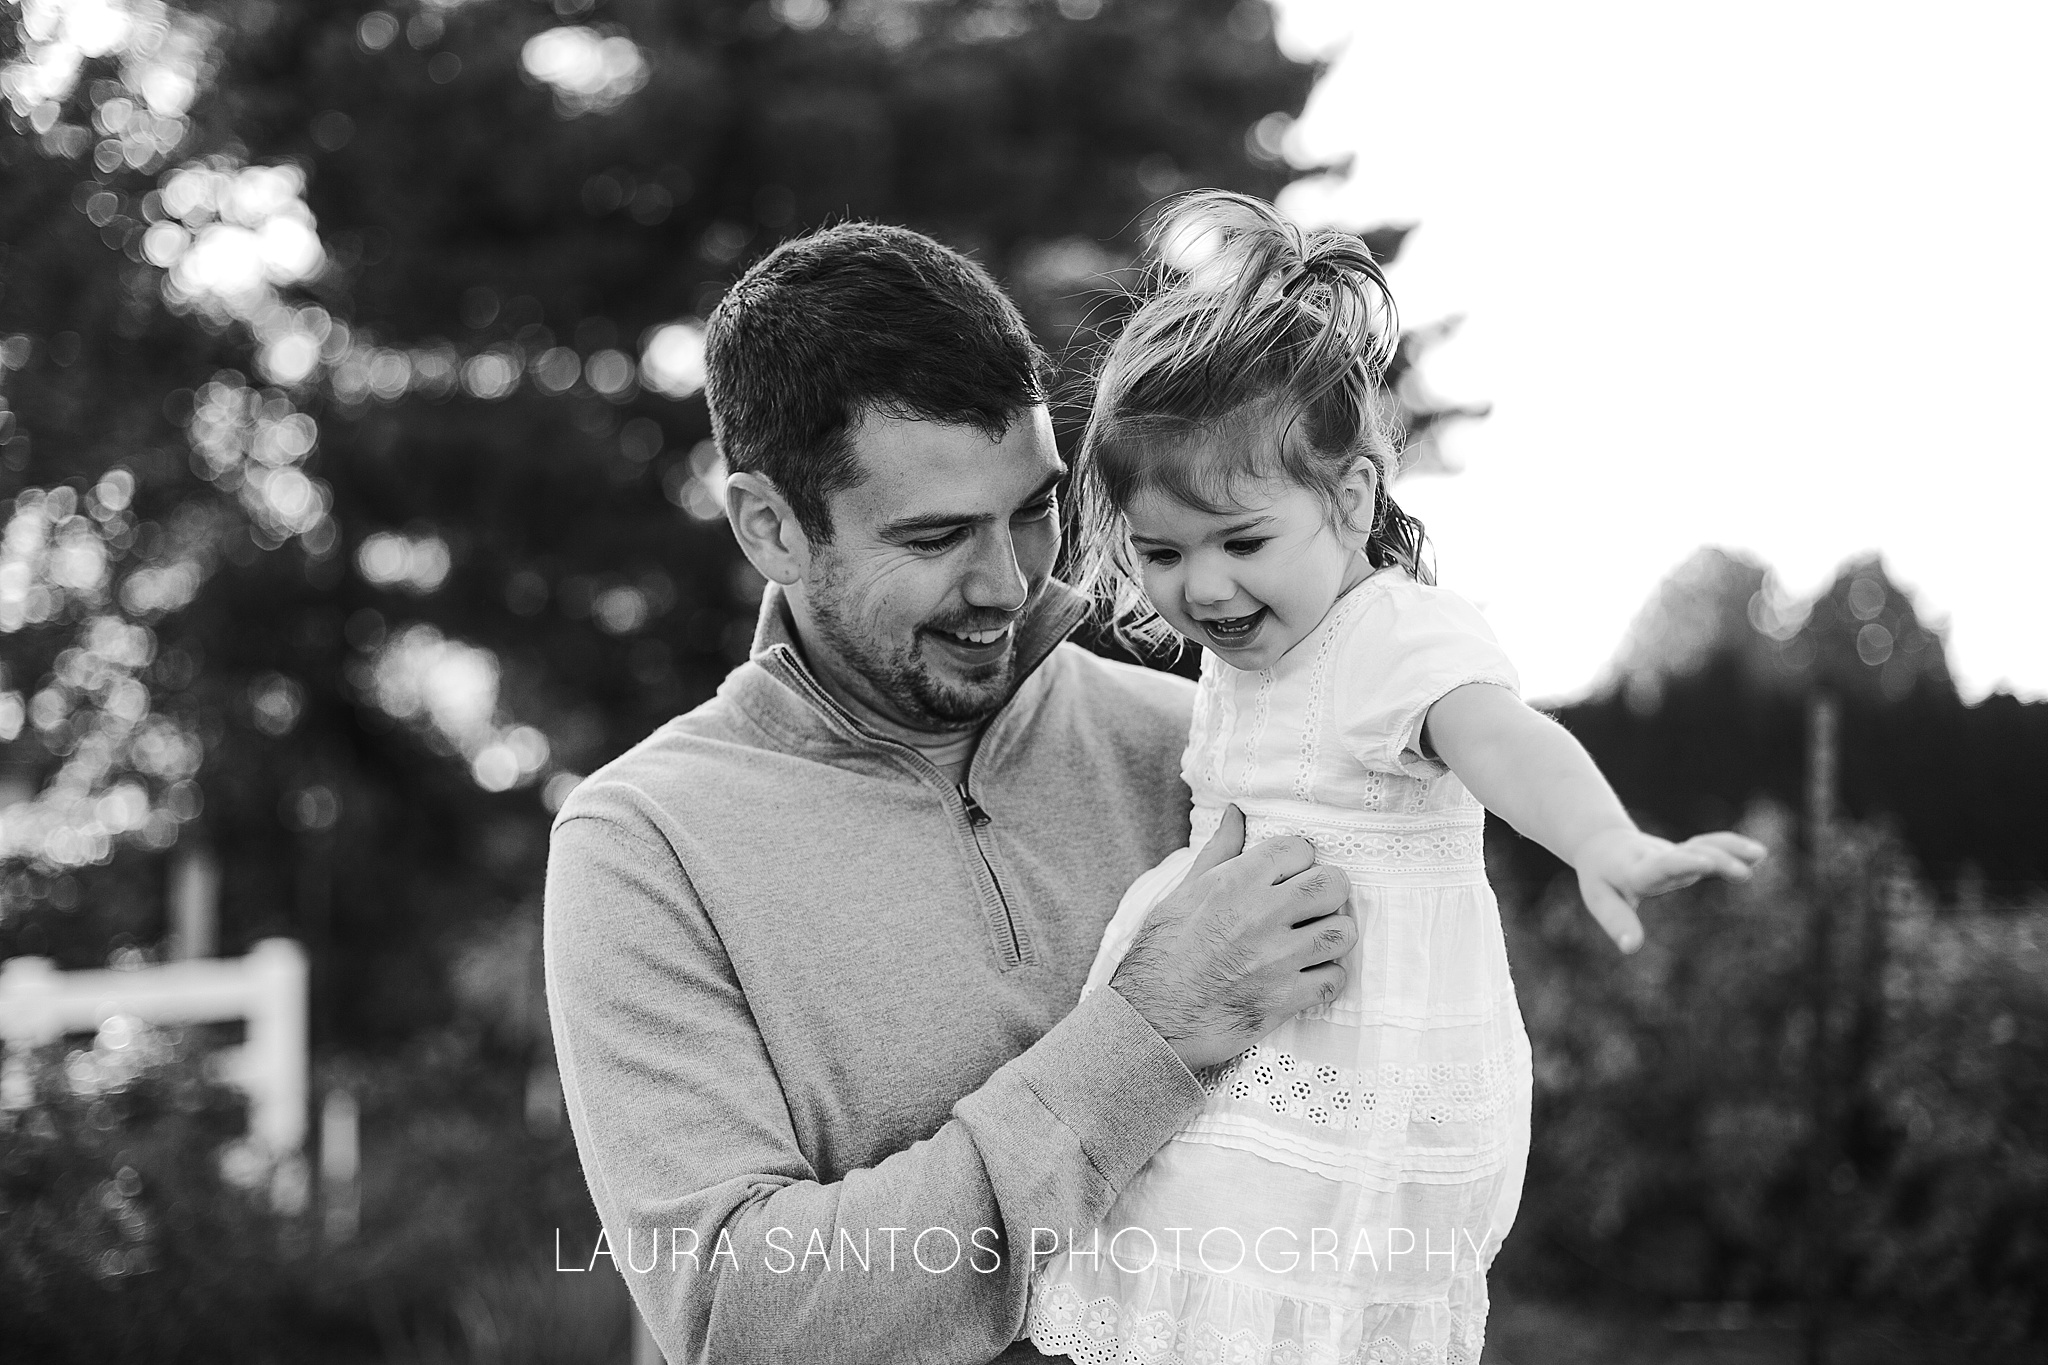 Laura Santos Photography Portland Oregon Family Photographer_0844.jpg